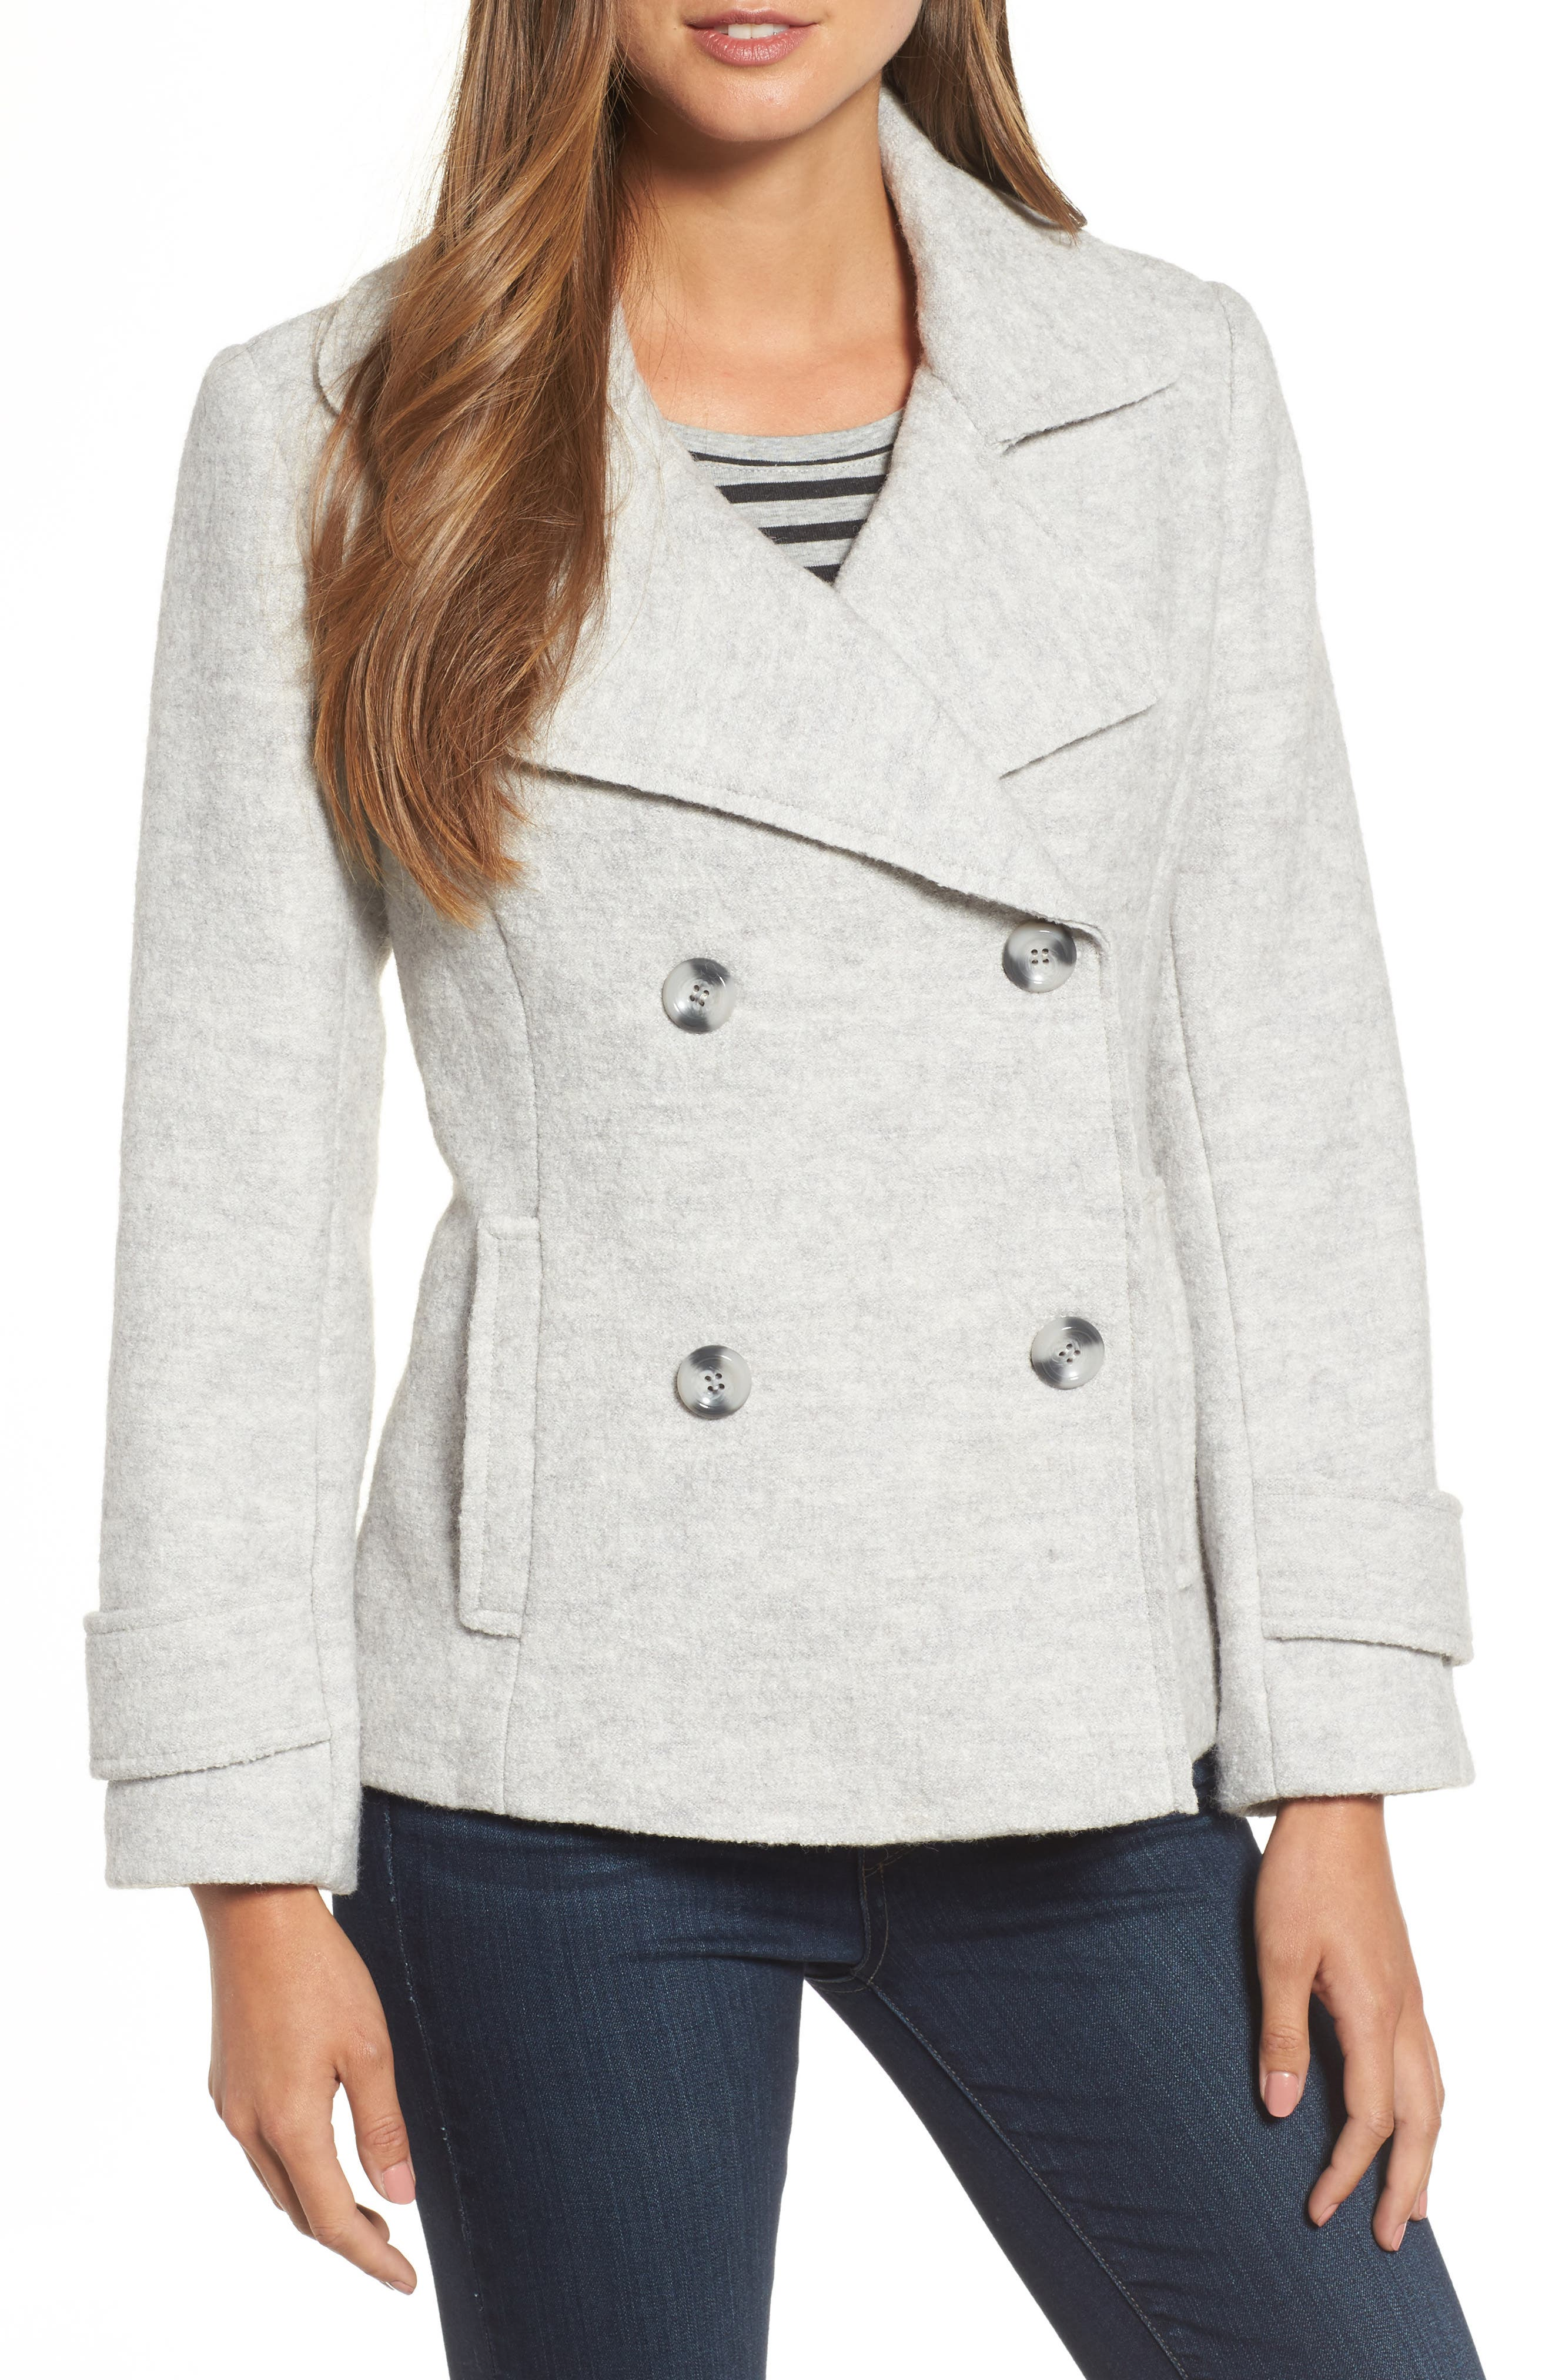 Main Image - Halogen® Double Breasted Jacket